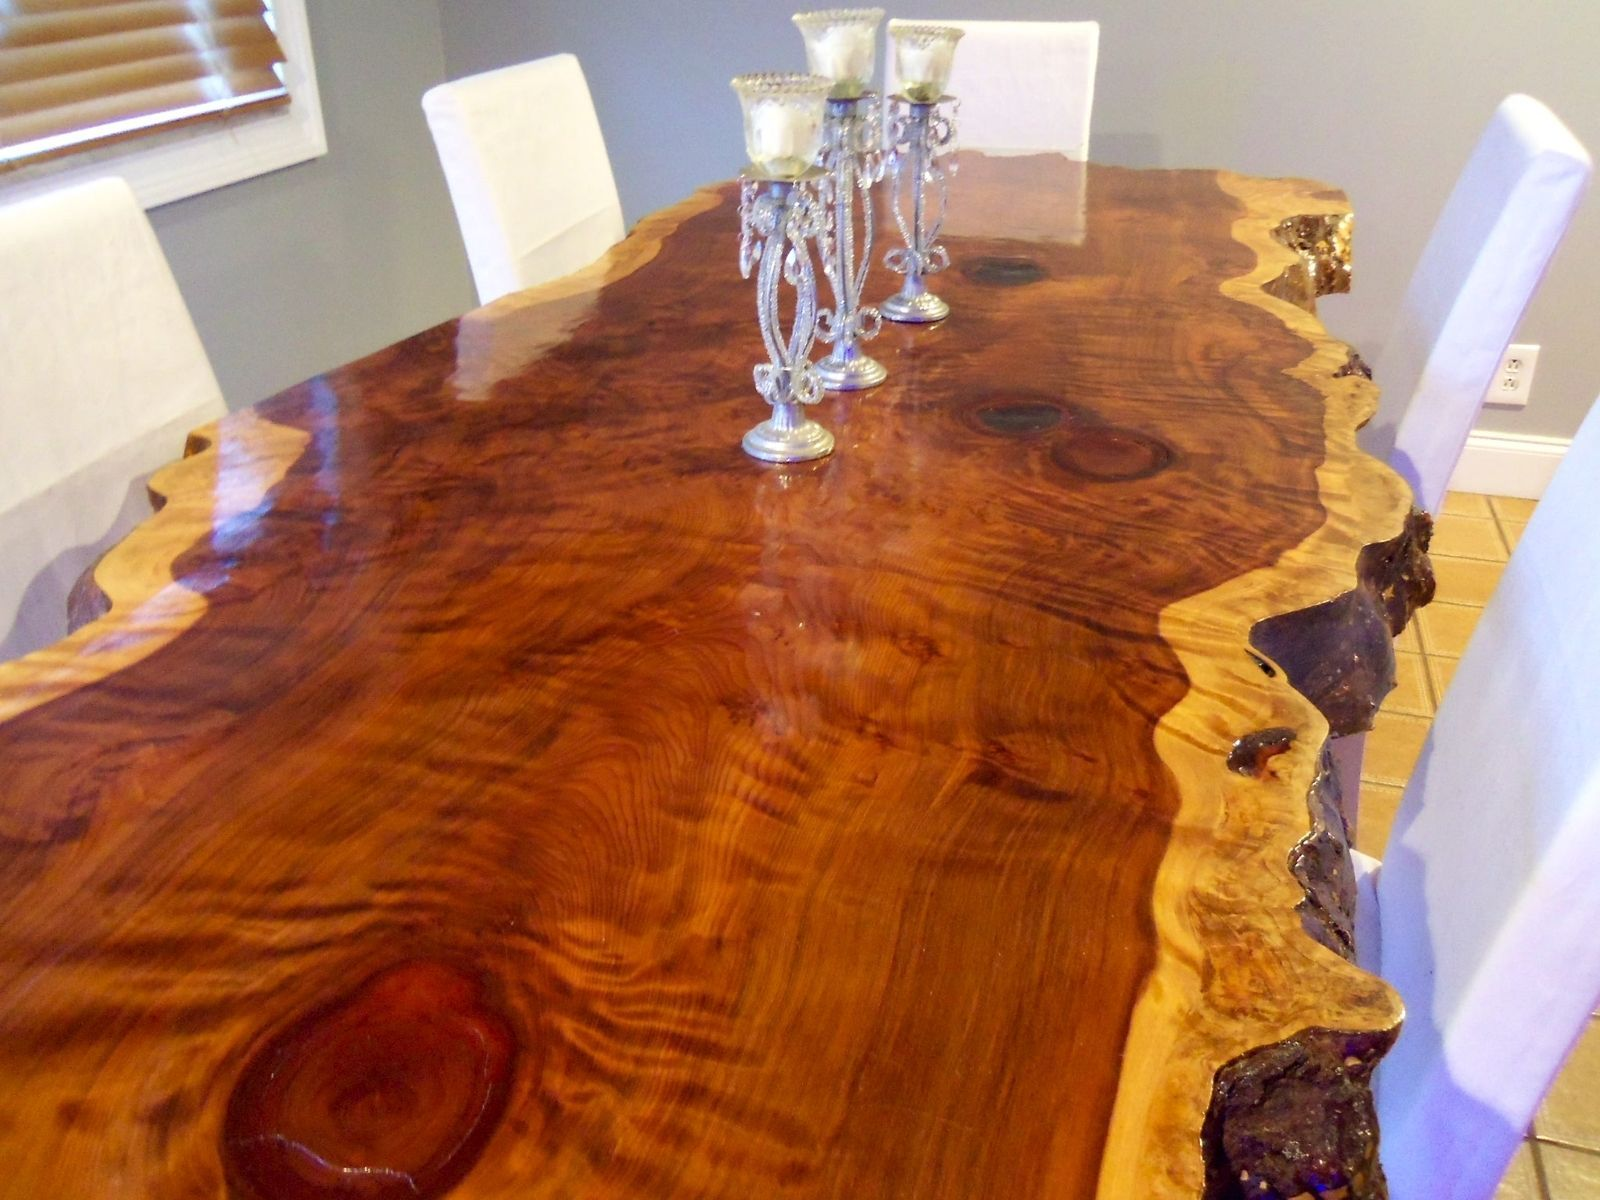 custom kitchen tables Custom Made Live Edge Redwood Kitchen Table Wood SlabKitchen Tables